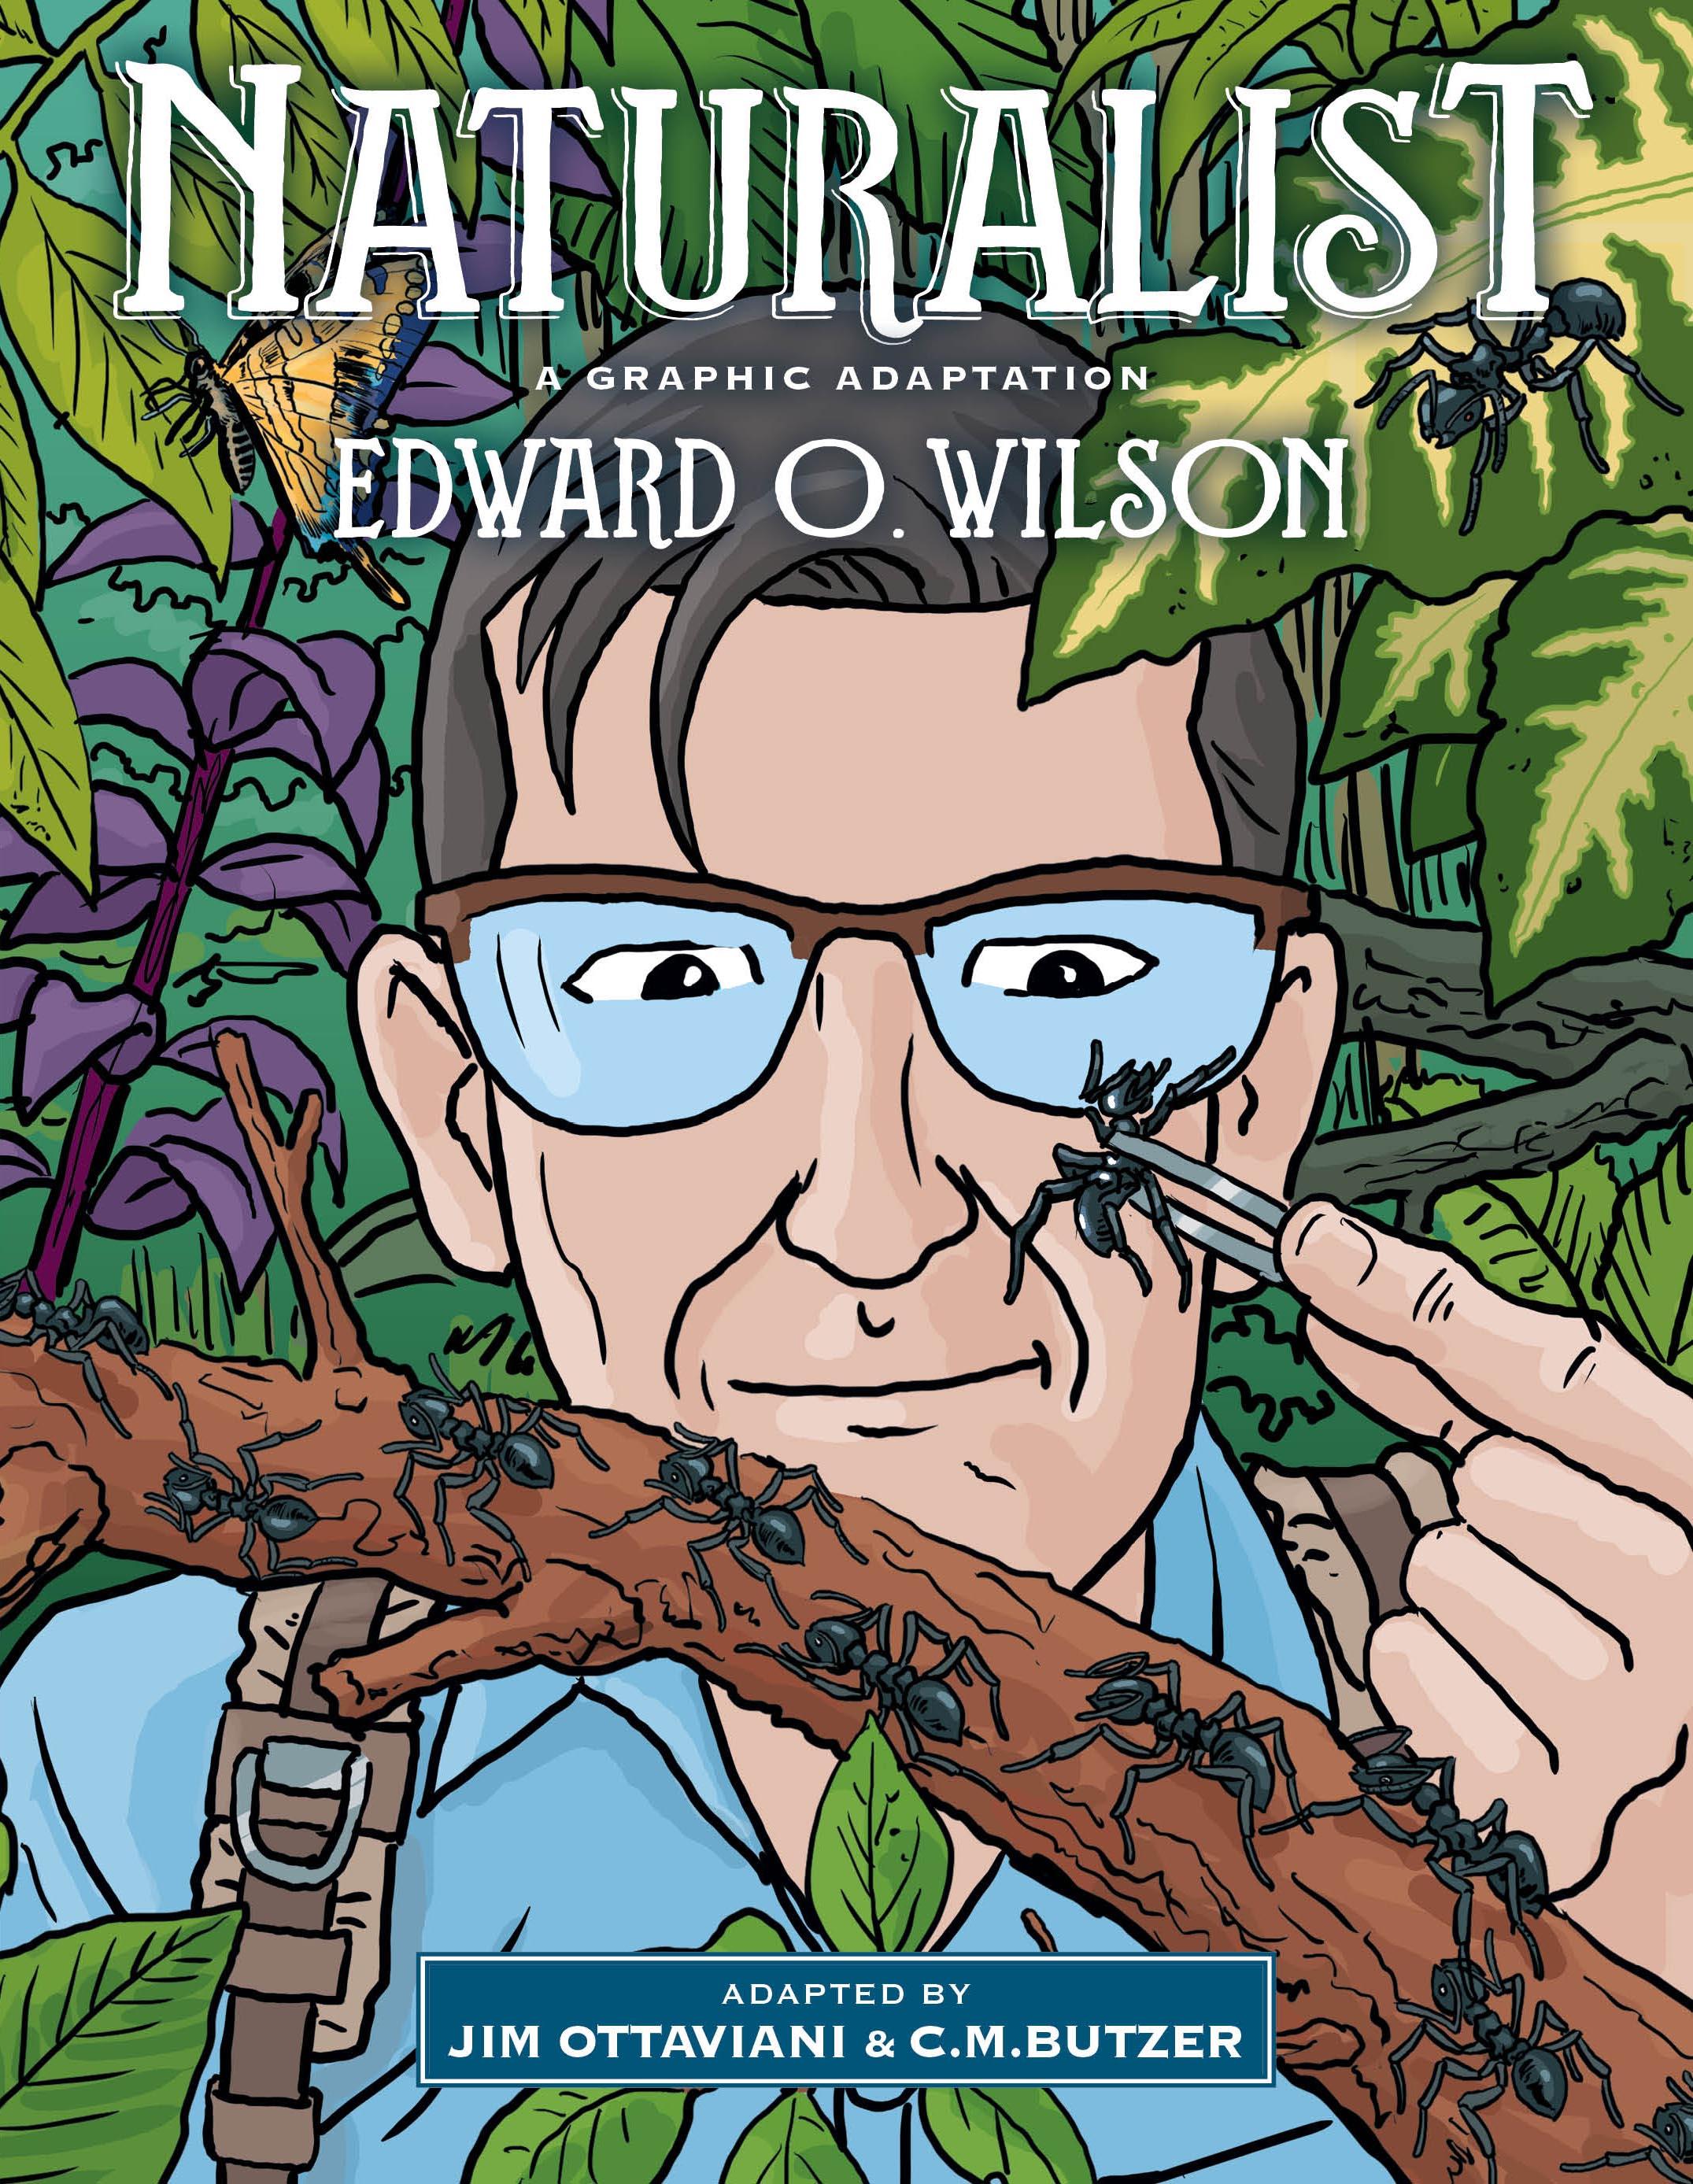 Naturalist: A Graphic Adaptation by C.M. Butzer, Edward O. Wilson, Jim Ottaviani